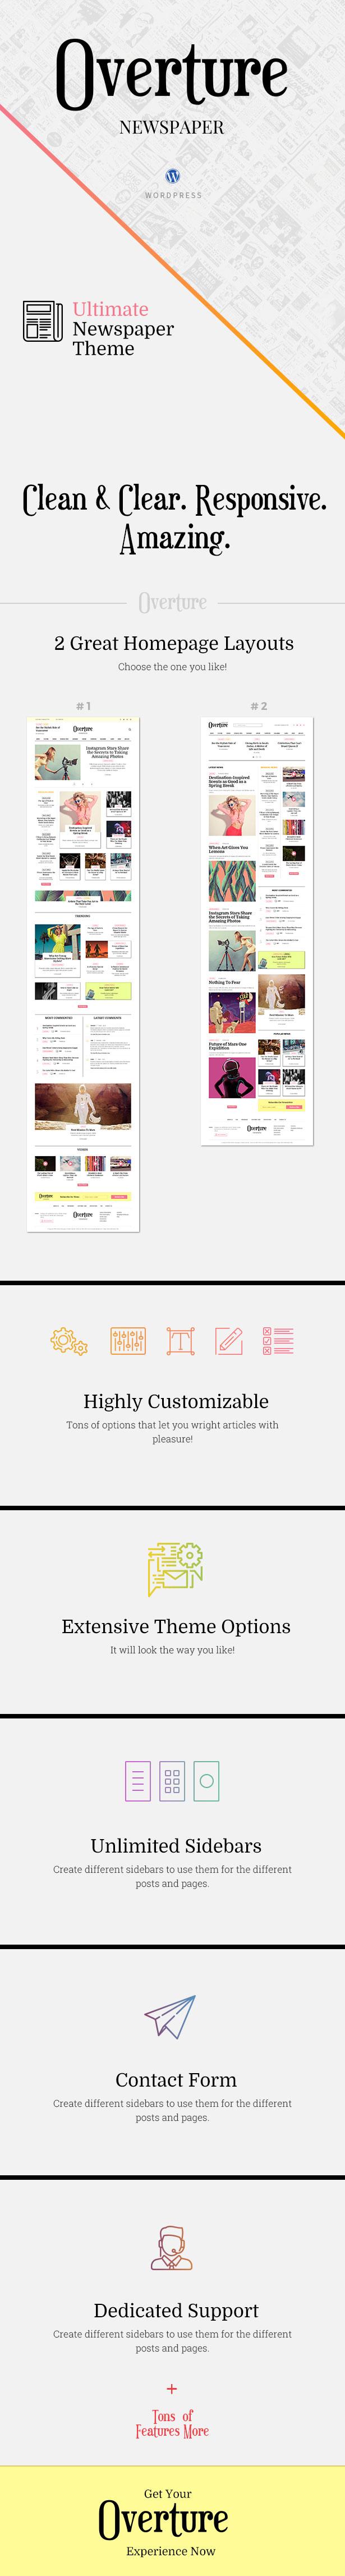 Overture - WordPress Magazine News Theme - 1